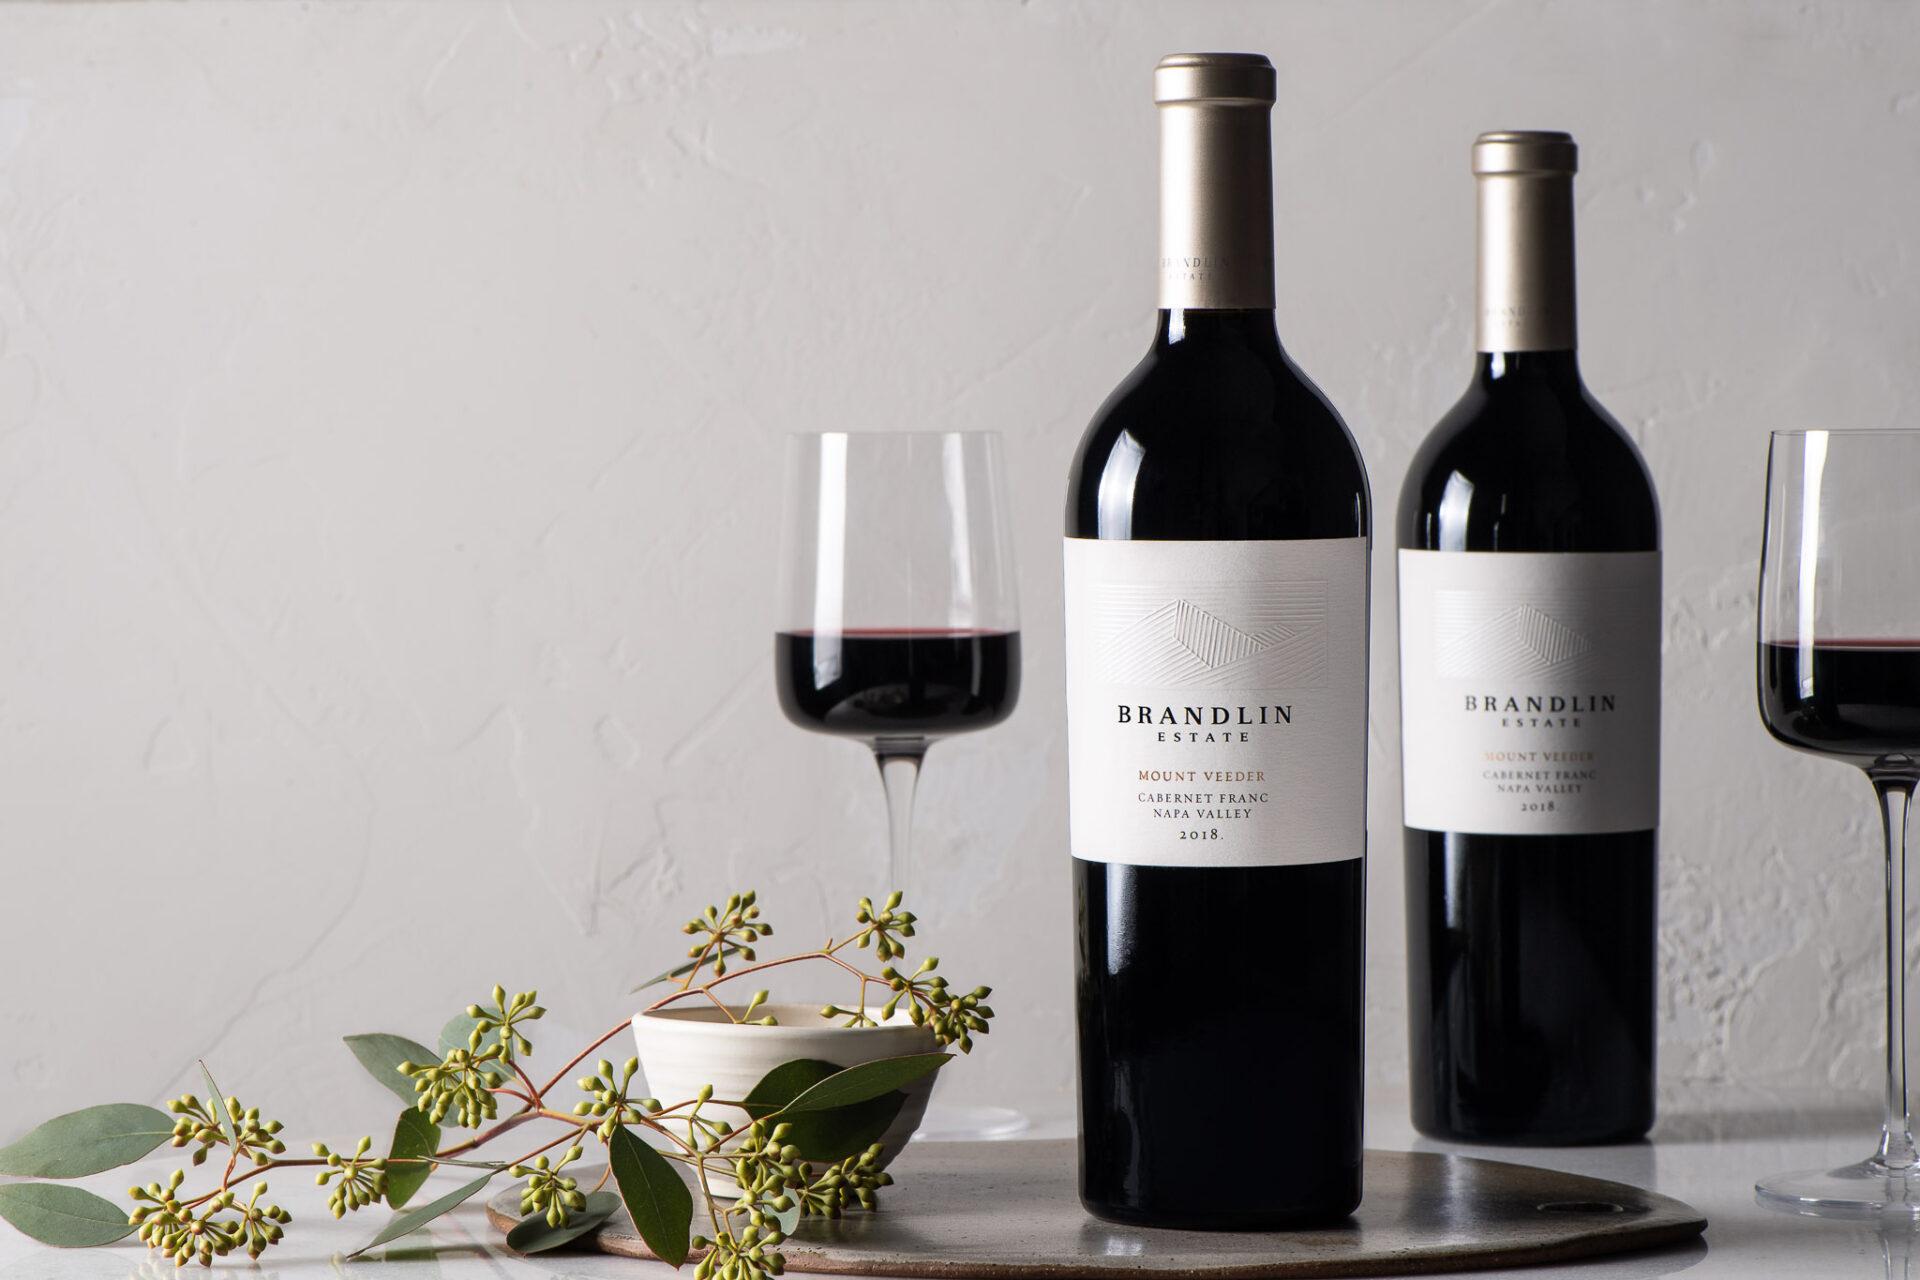 Brandlin event featured wines